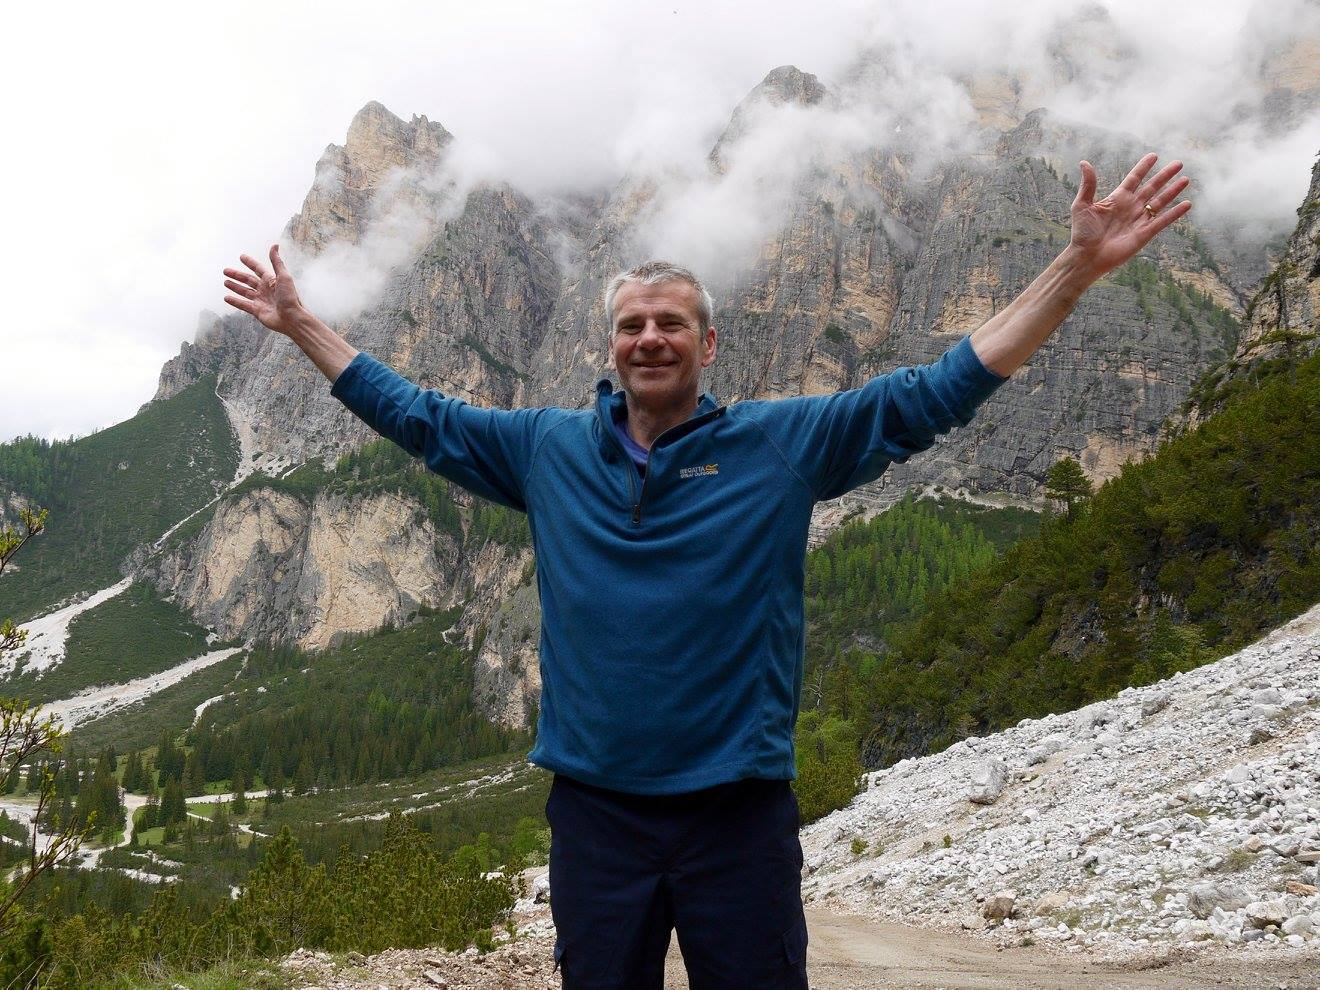 Enjoying one of my favourite activities - walking.  Dolomiti, Italy